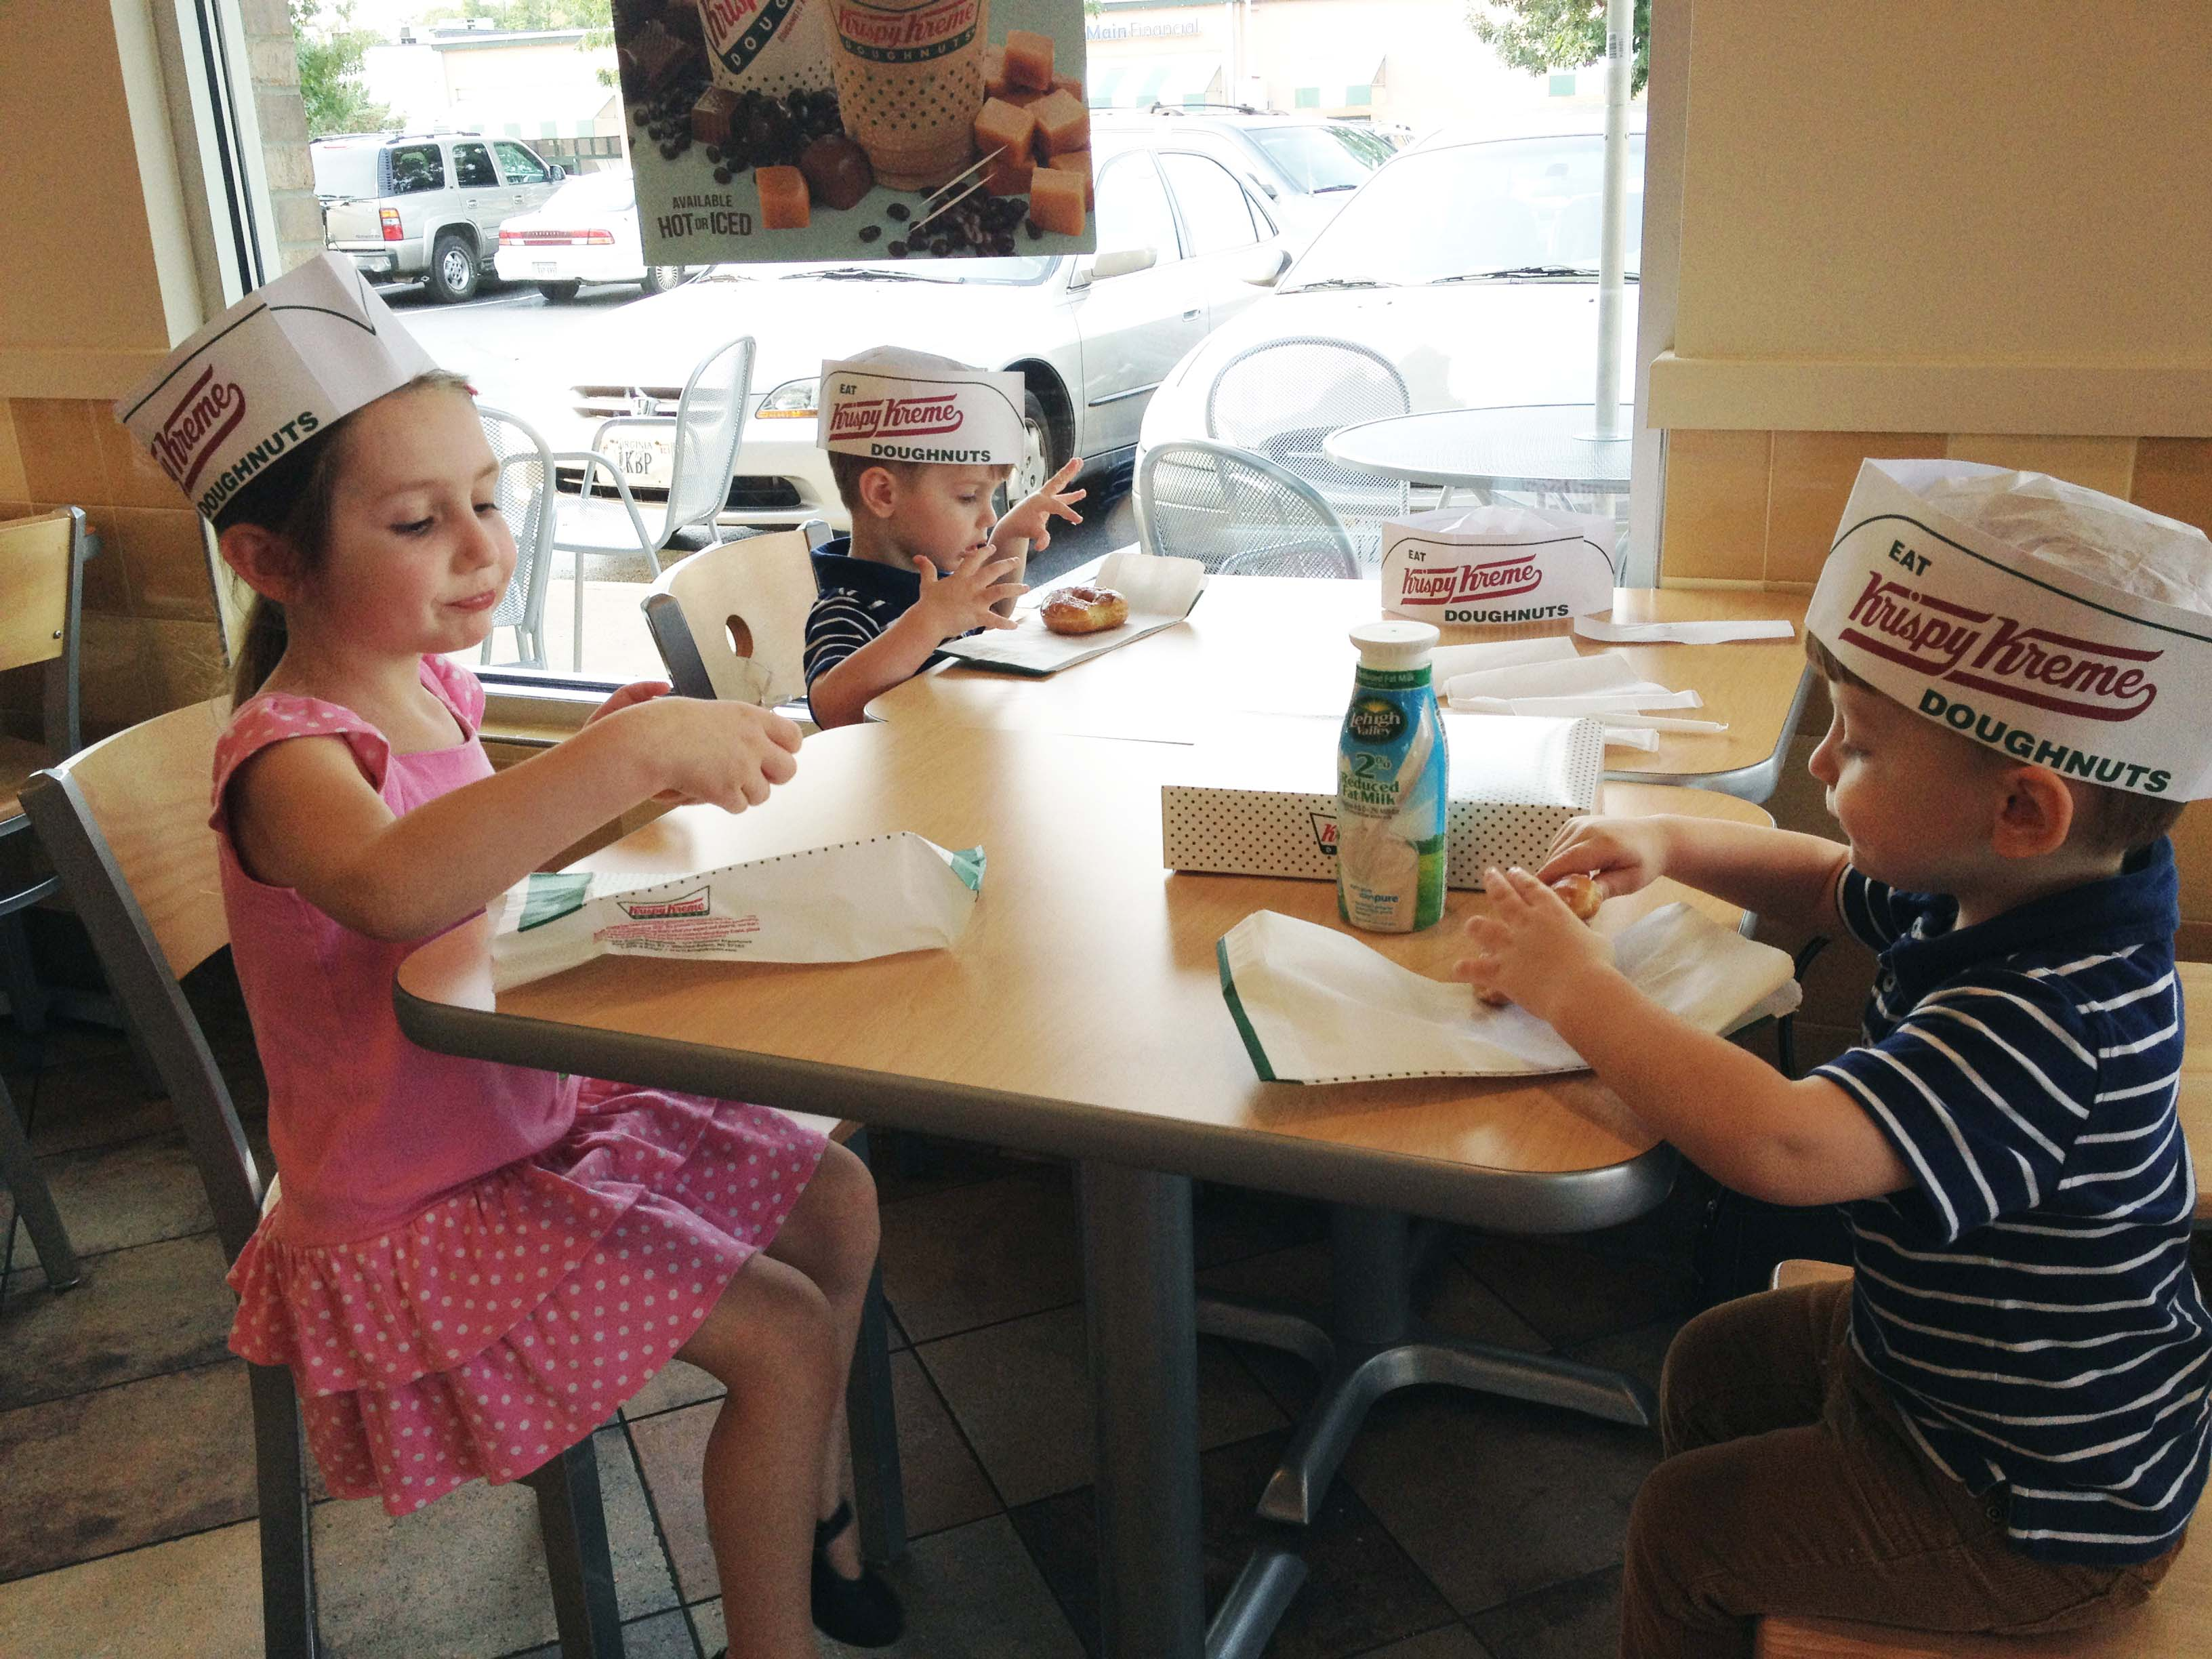 Krispy Kreme hats